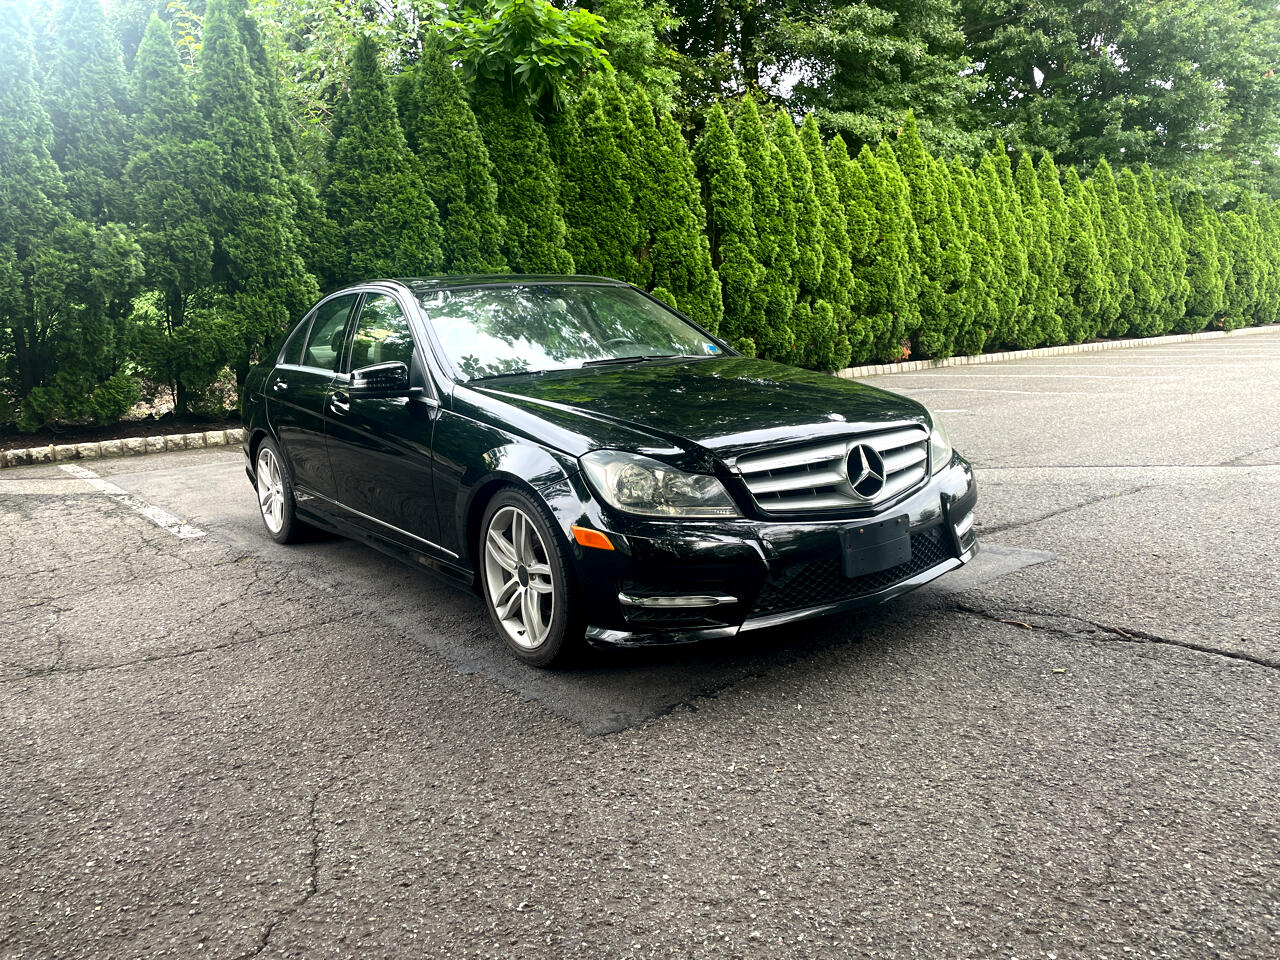 Mercedes-Benz C-Class C300 4MATIC Luxury Sedan 2012